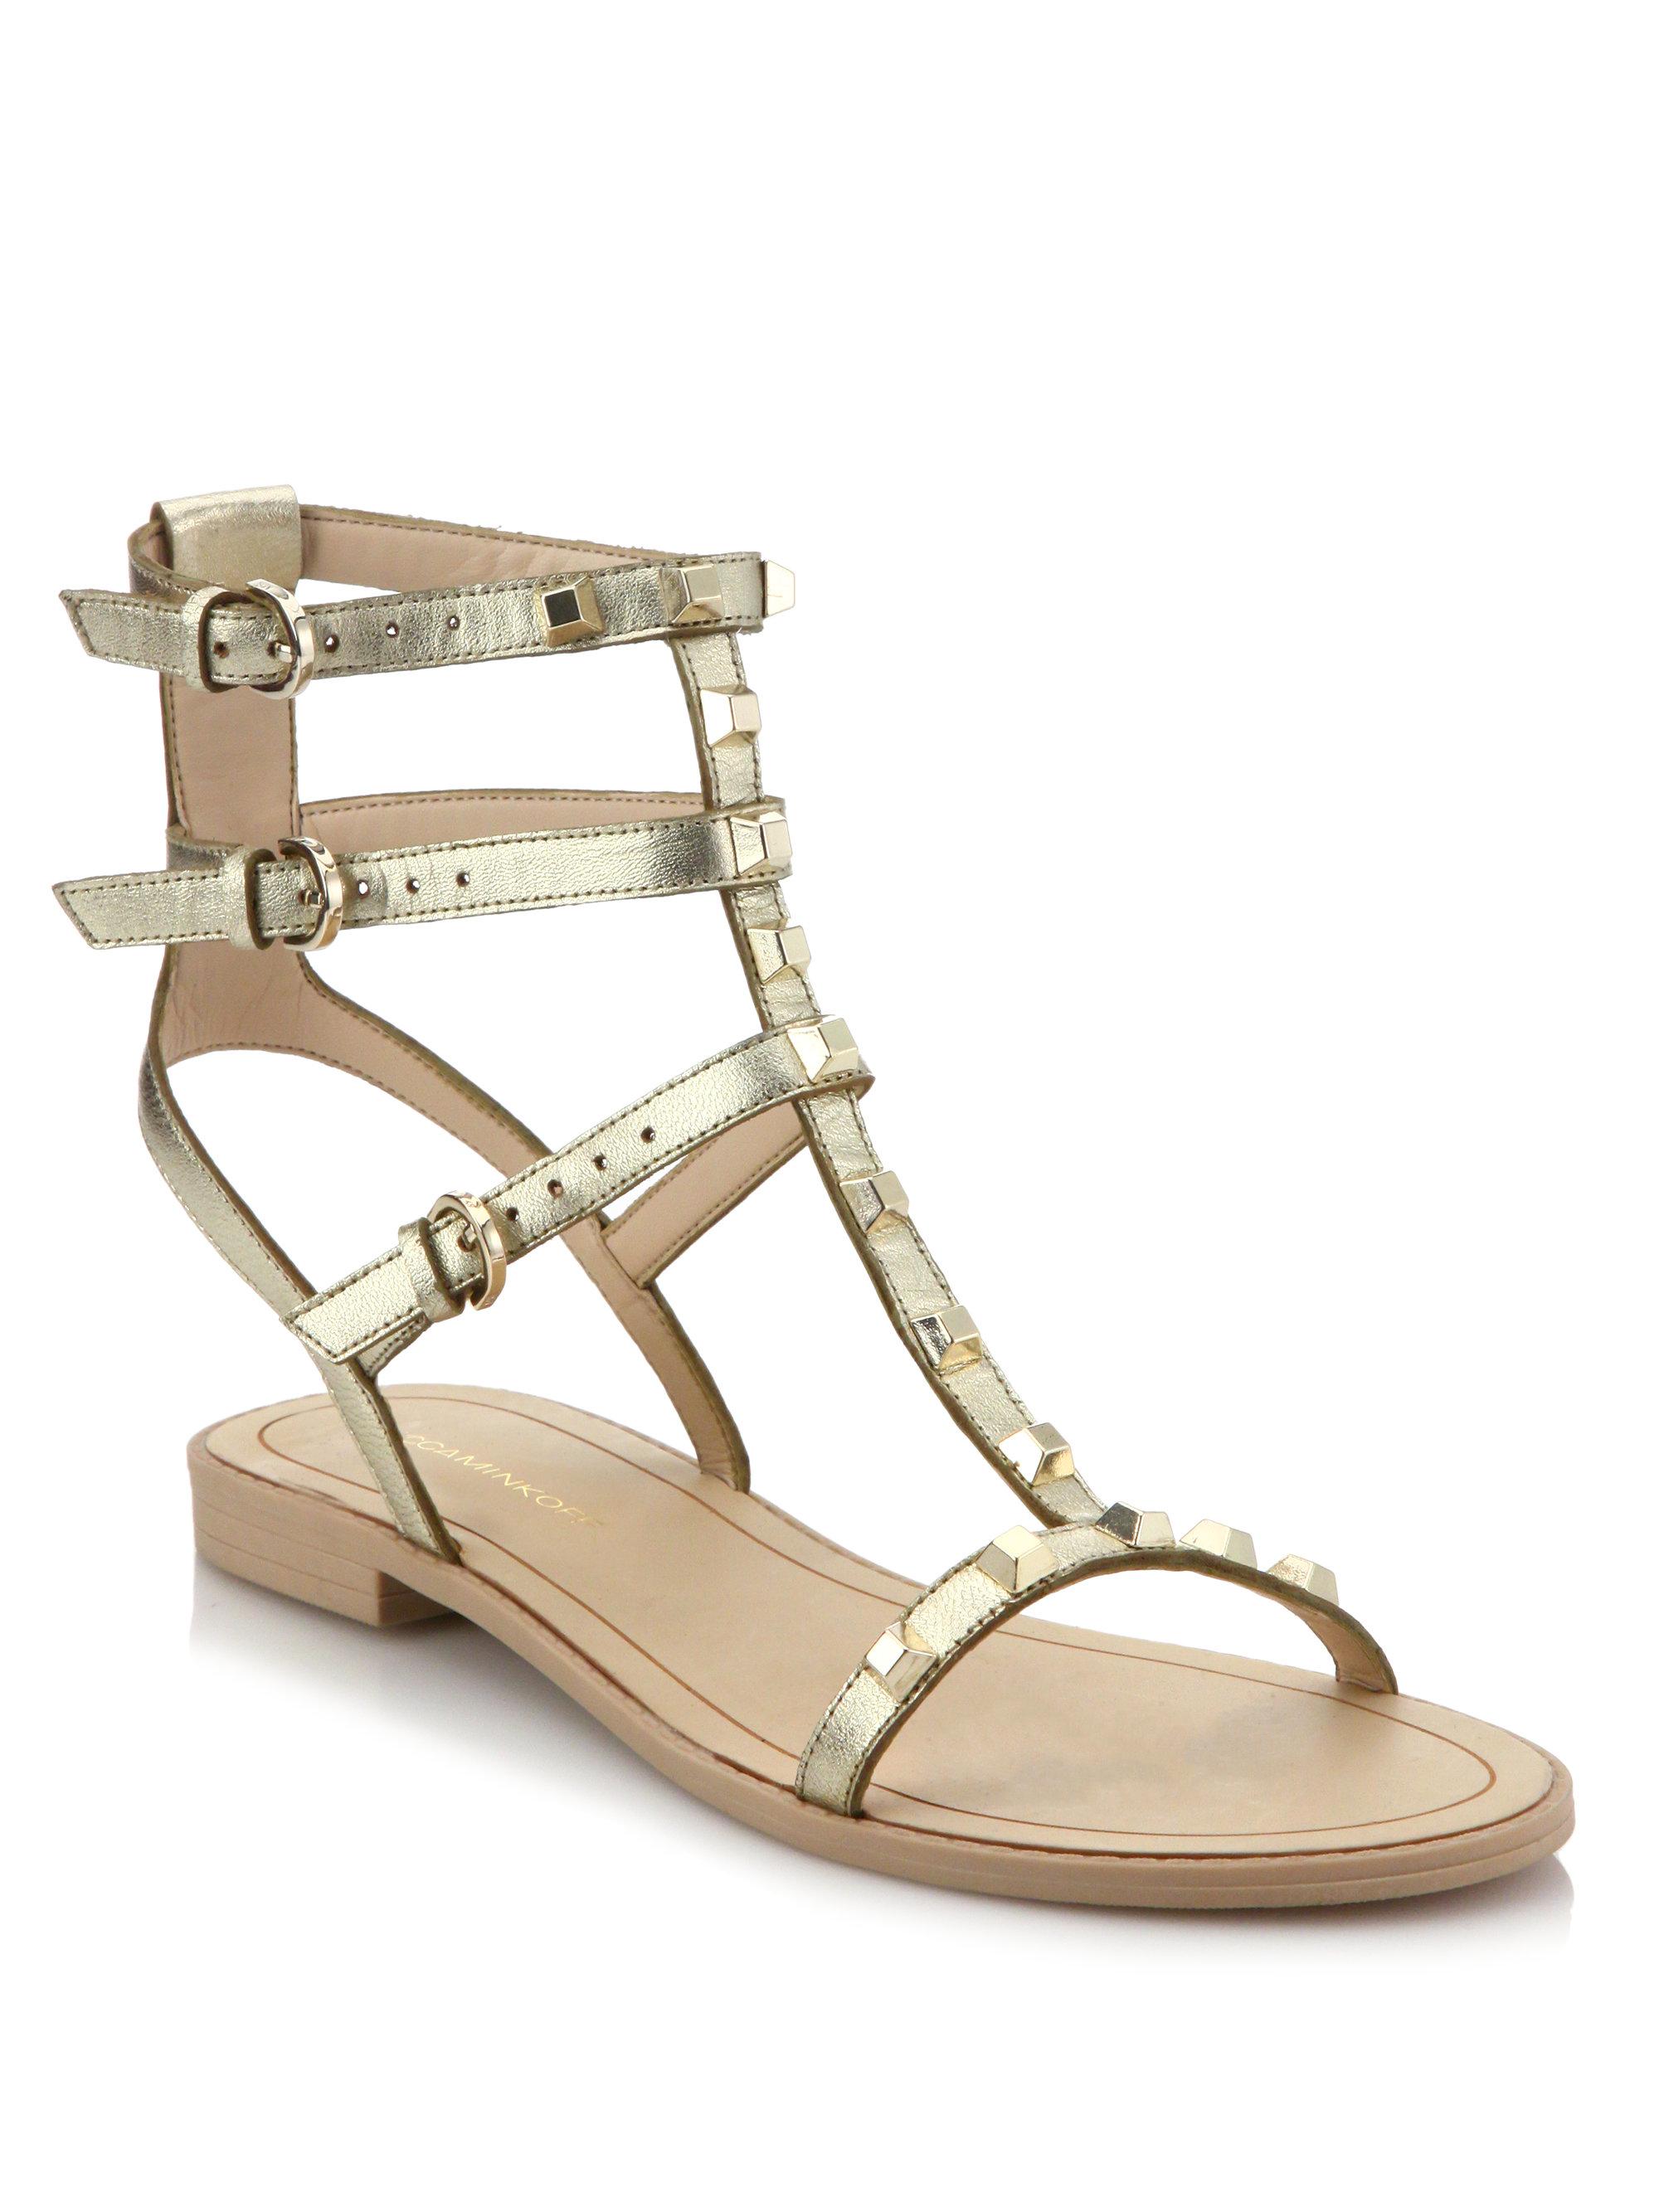 adda99a6492 Lyst - Rebecca Minkoff Georgina Leather Gladiator Sandals in Metallic